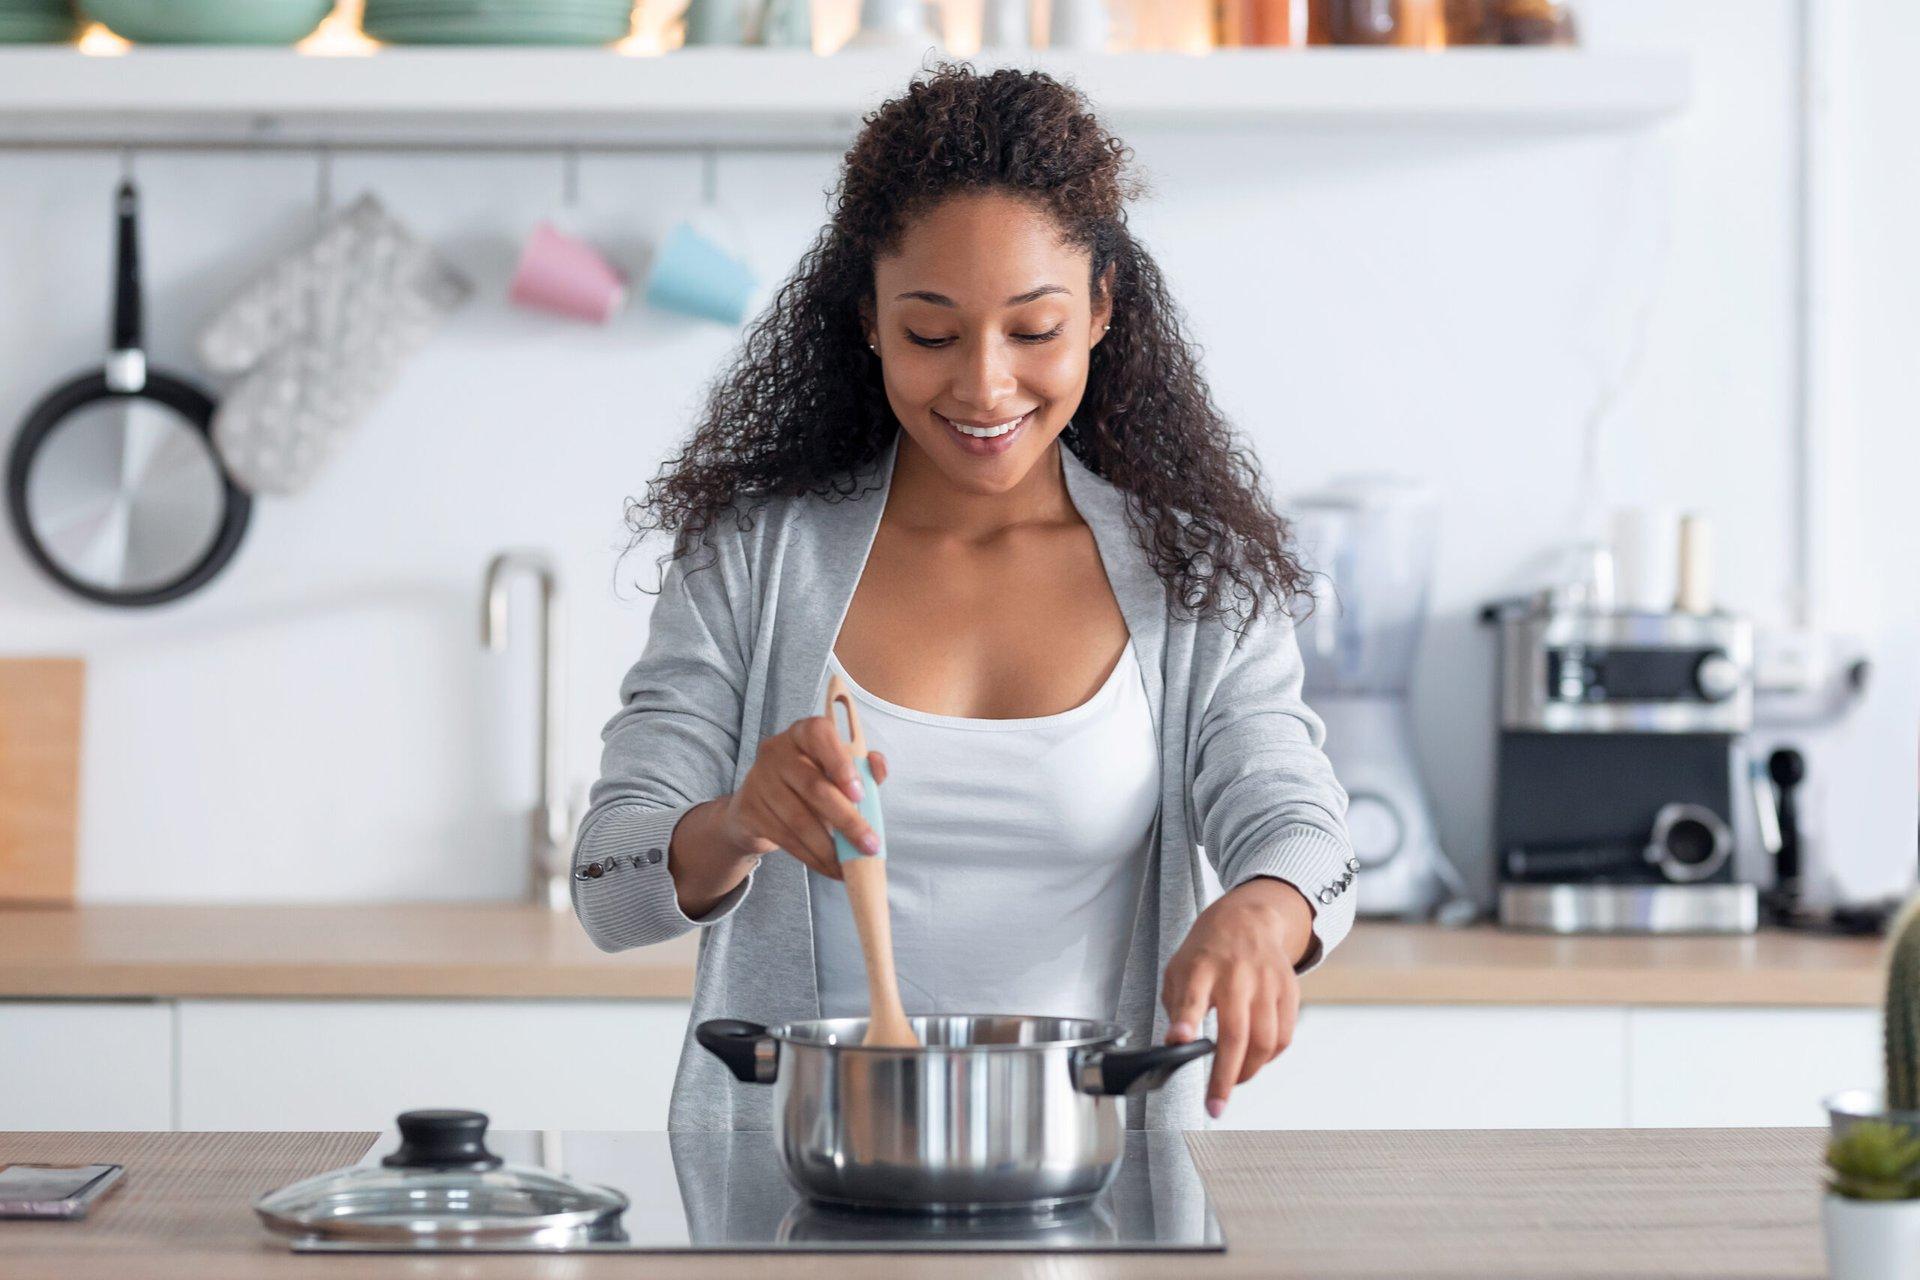 Happy woman preparing dinner at home